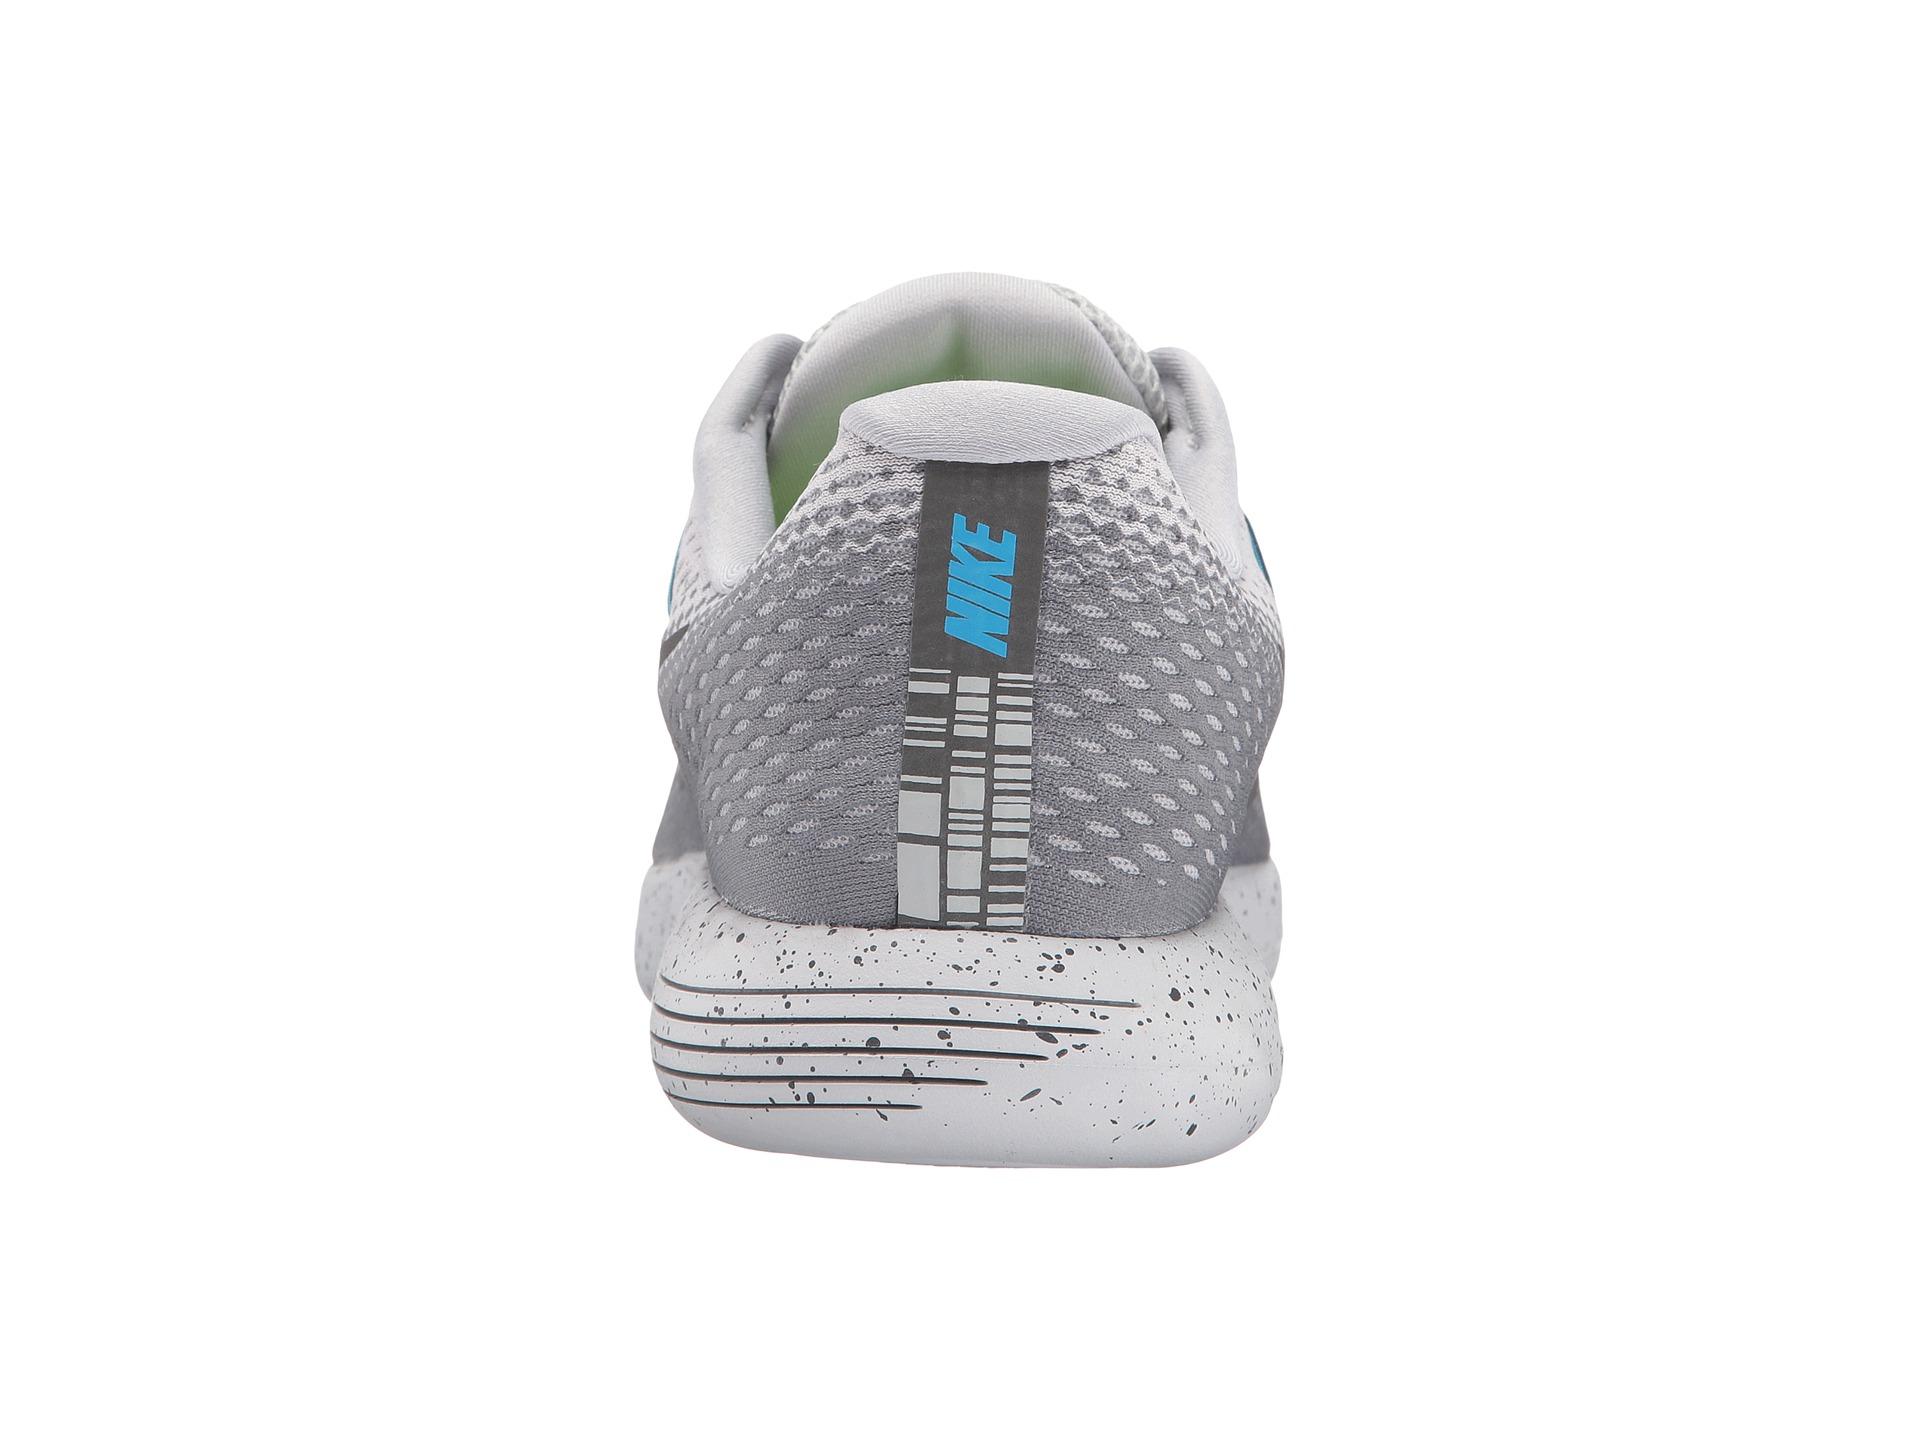 nike chaussures entraîneur lunaire - Nike LunarGlide 8 Shield - Zappos.com Free Shipping BOTH Ways